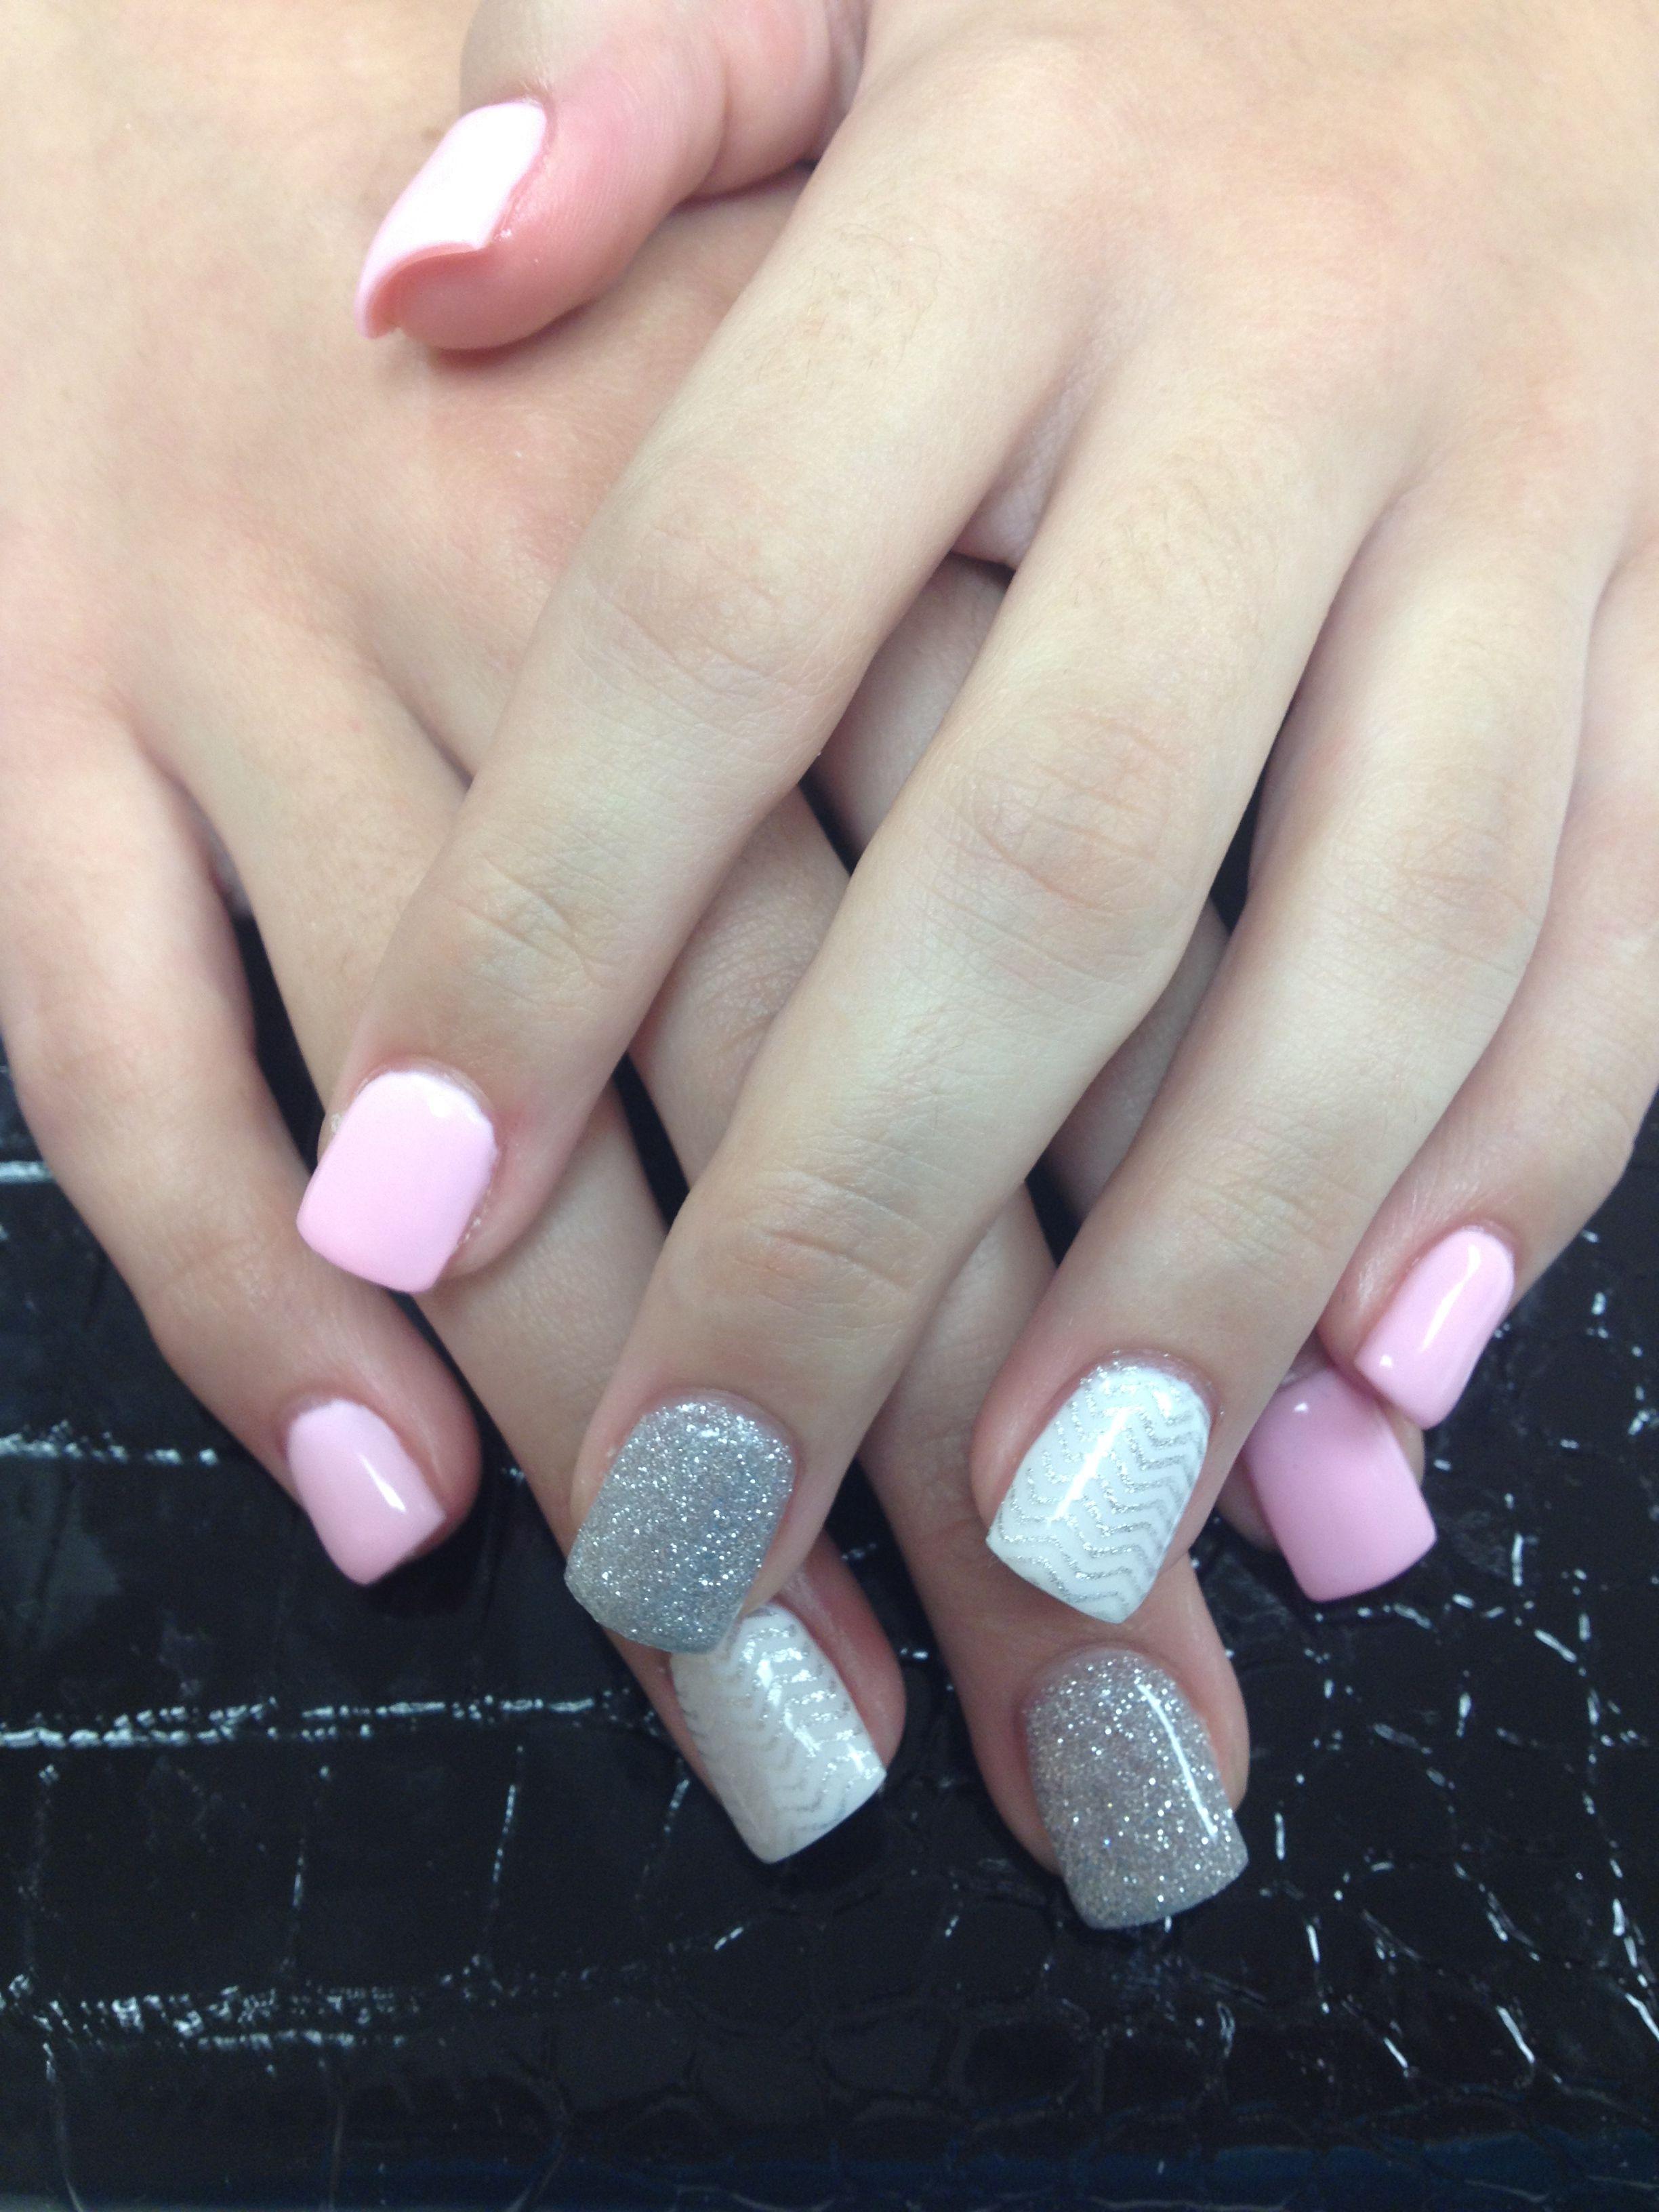 Full color nail art - Nails Full Color Gel